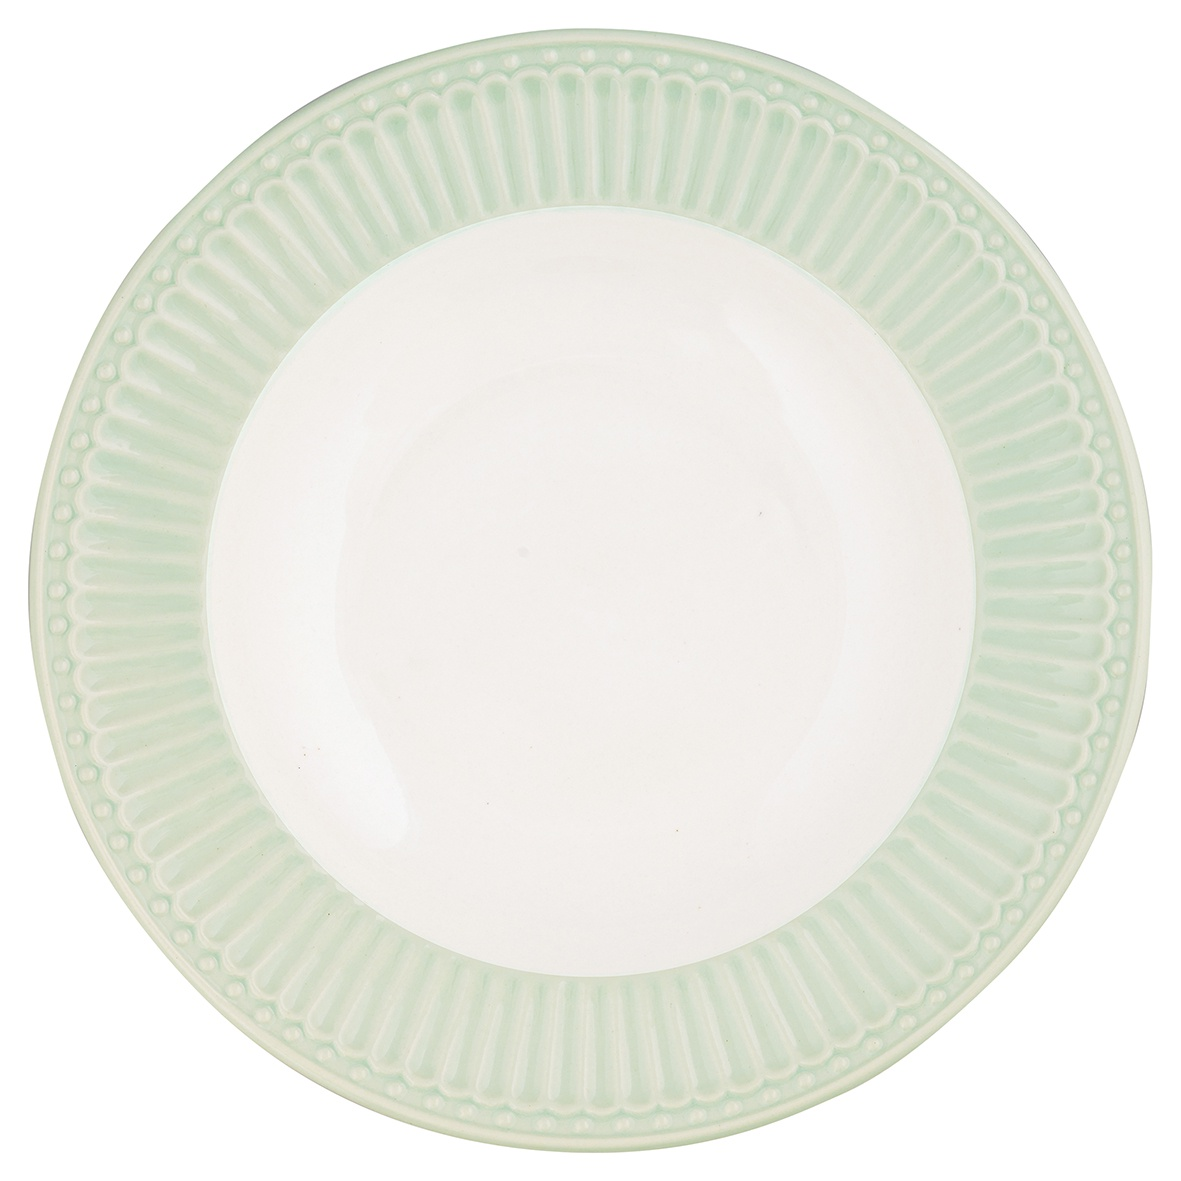 купить Глубокая тарелка Greengate Alice pale green 21,5 см по цене 702 рублей